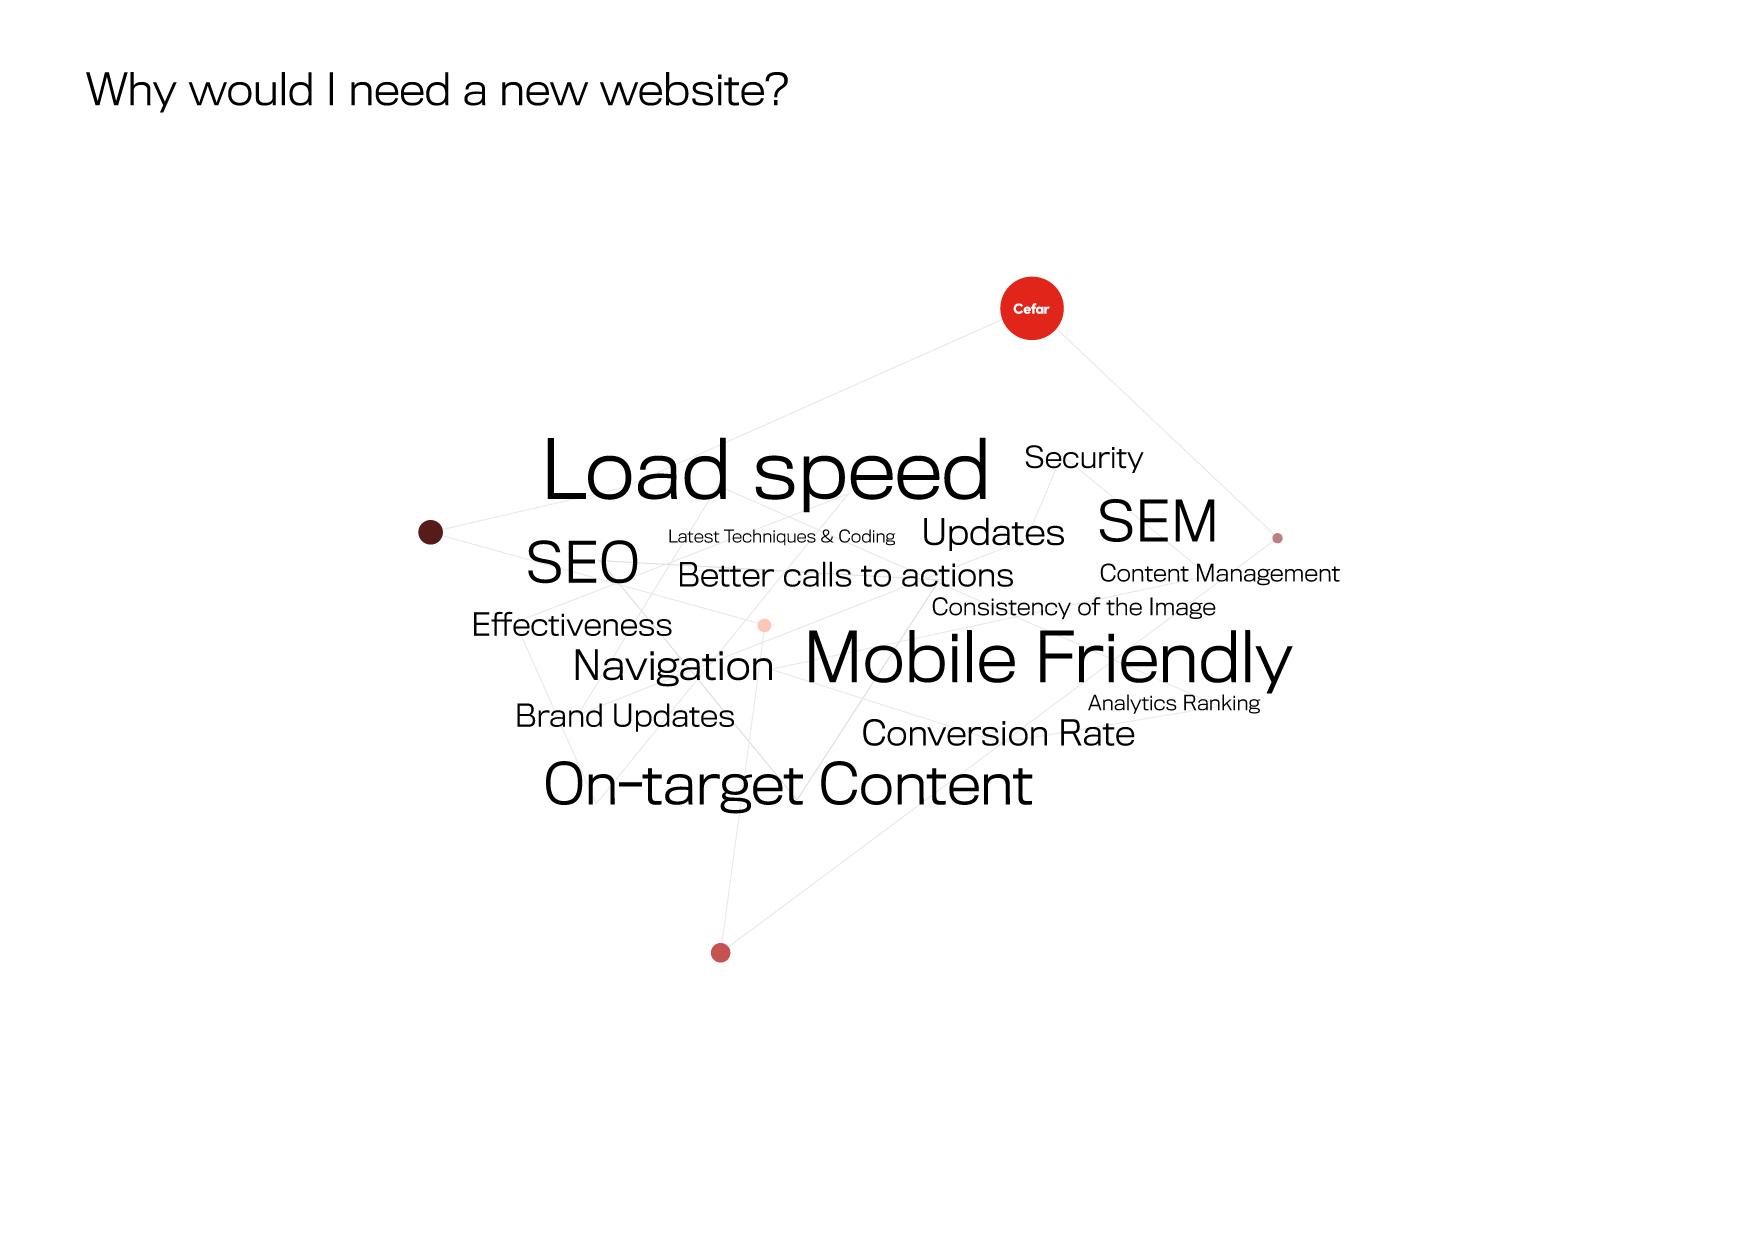 Web SEO Attributes of Web Design